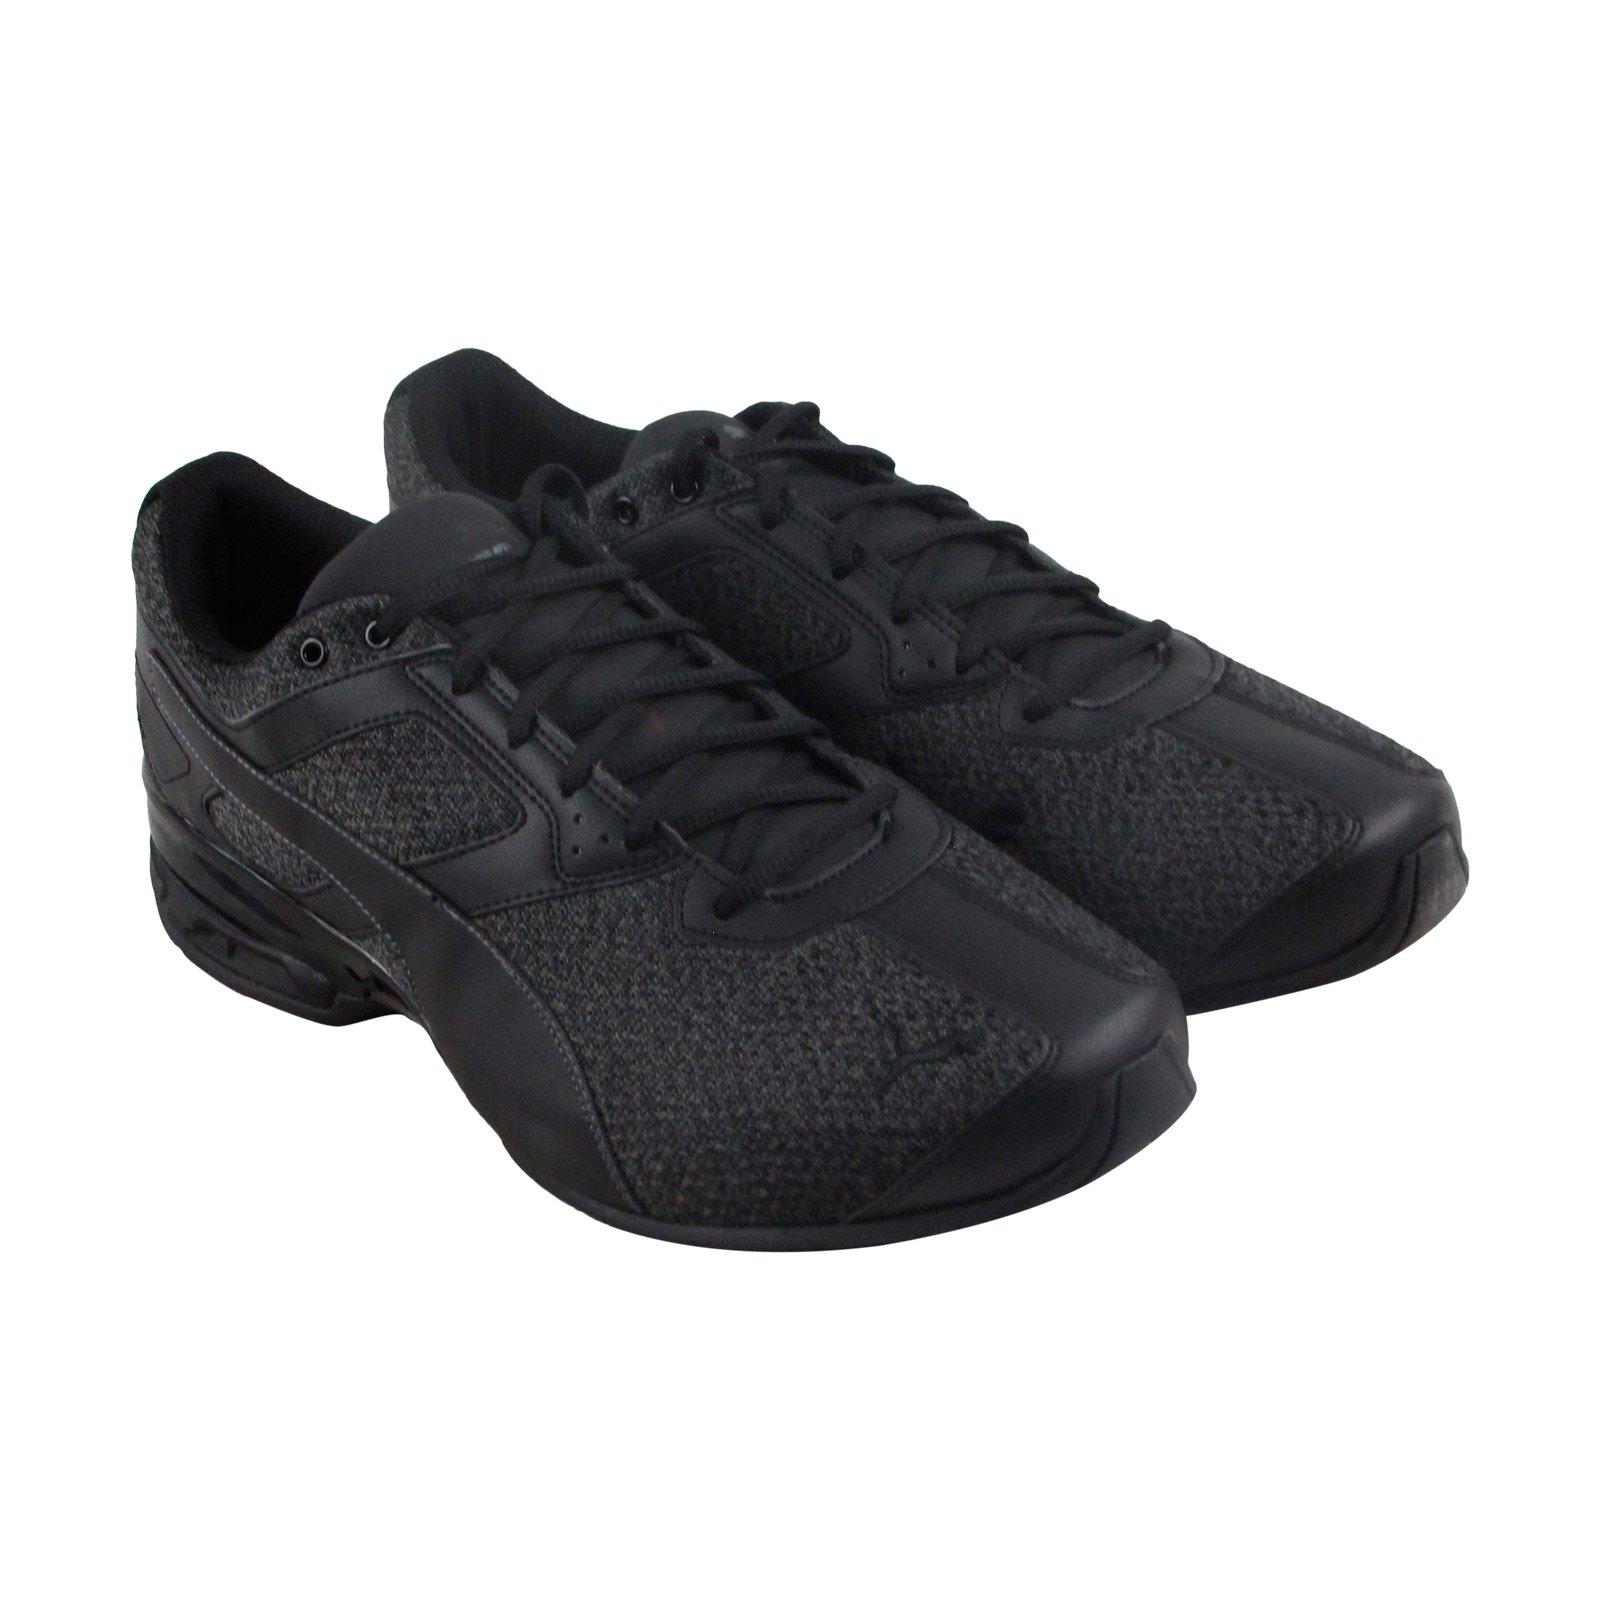 PUMA Men's Tazon 6 Knit Sneaker, Black Asphalt,9.5 M US